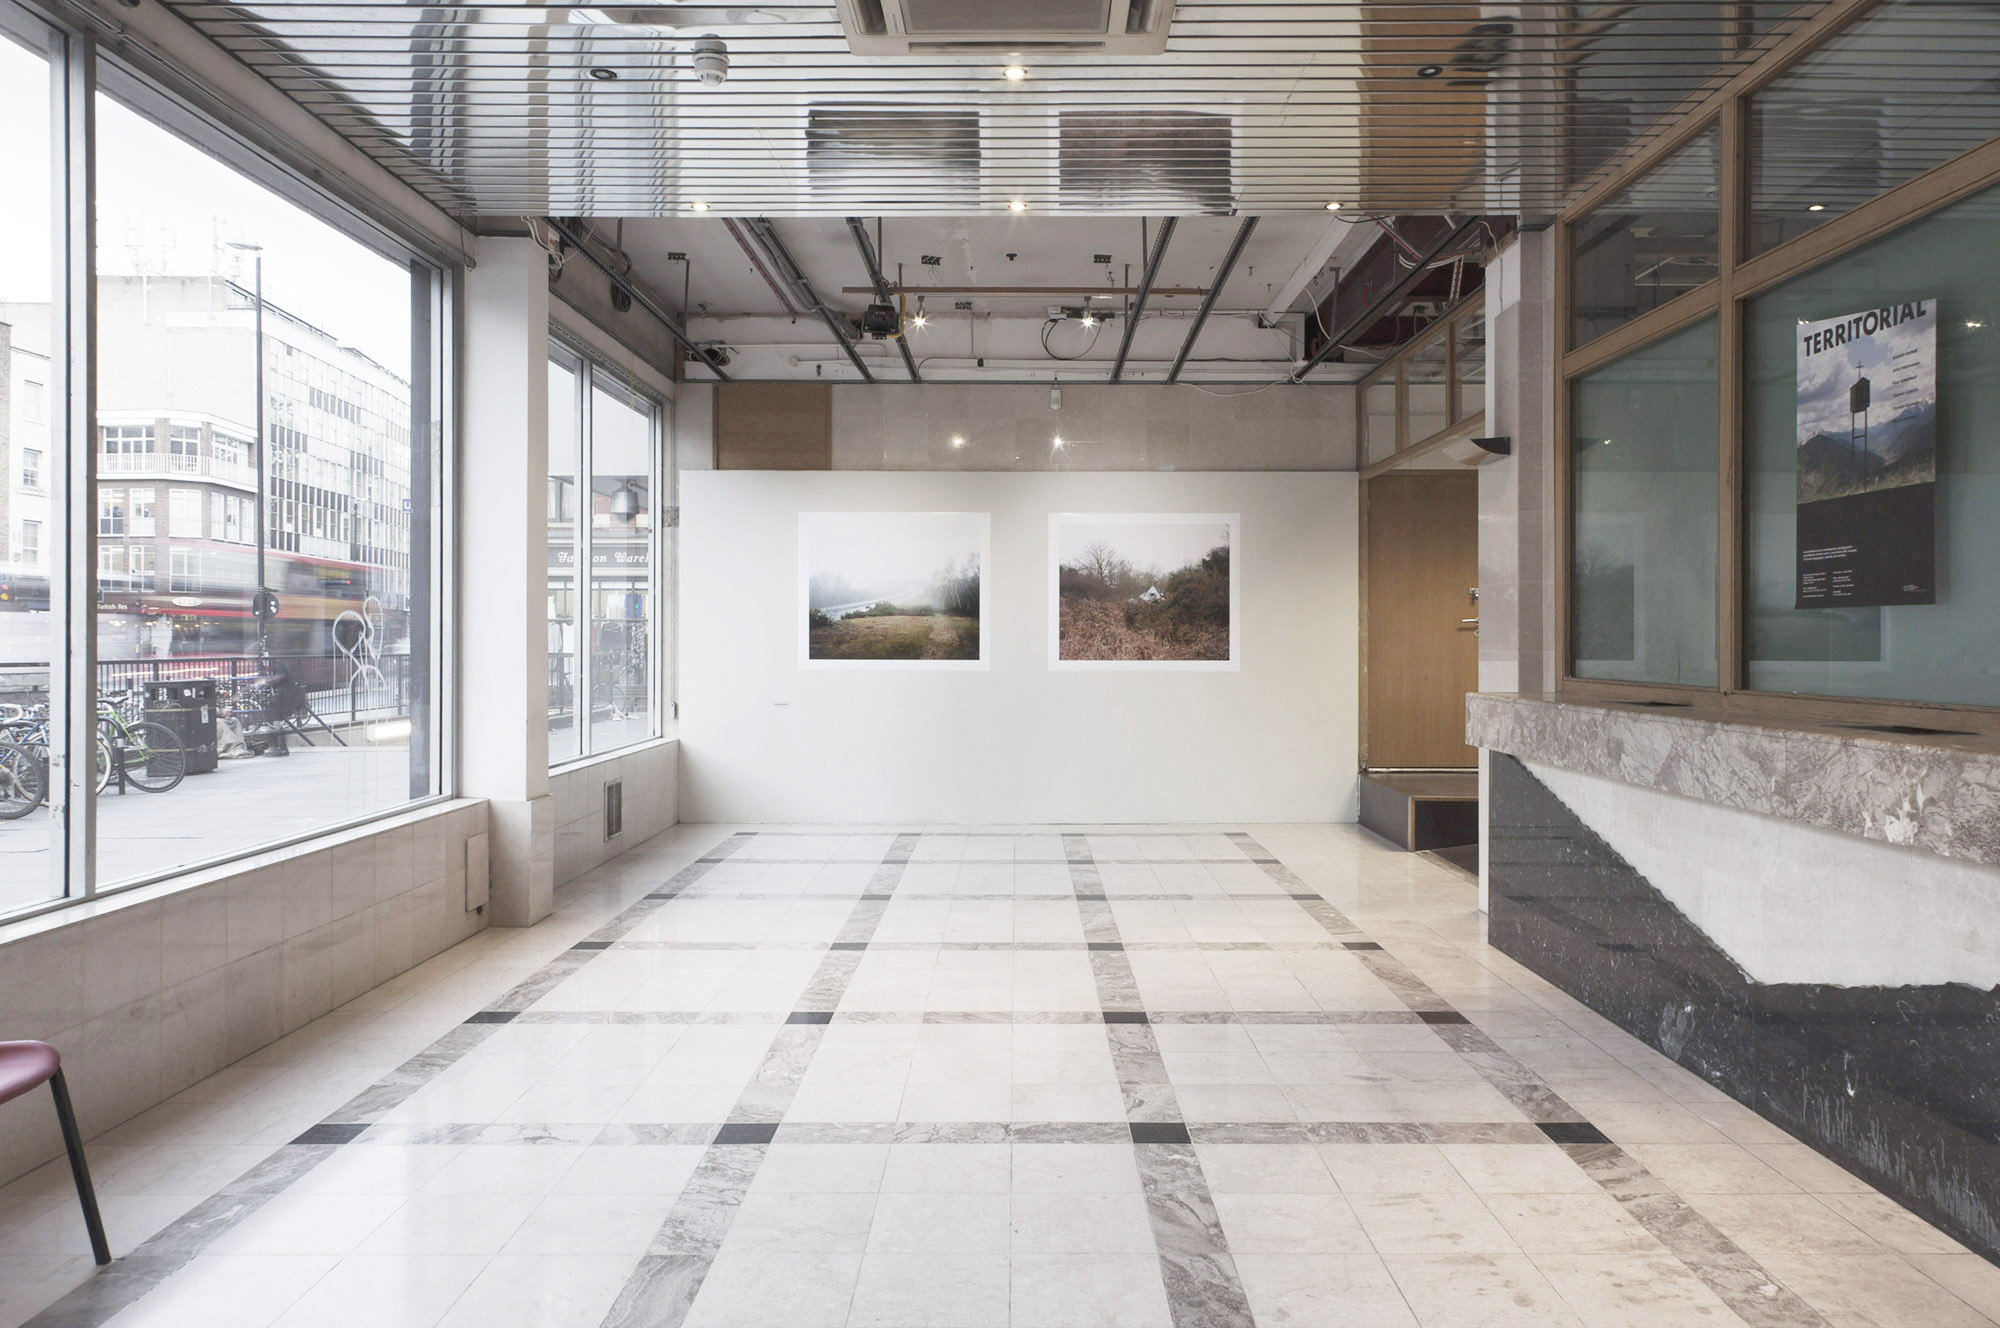 Territorial exhibition, the CASS Bank Space Gallery, London Metropolitan University